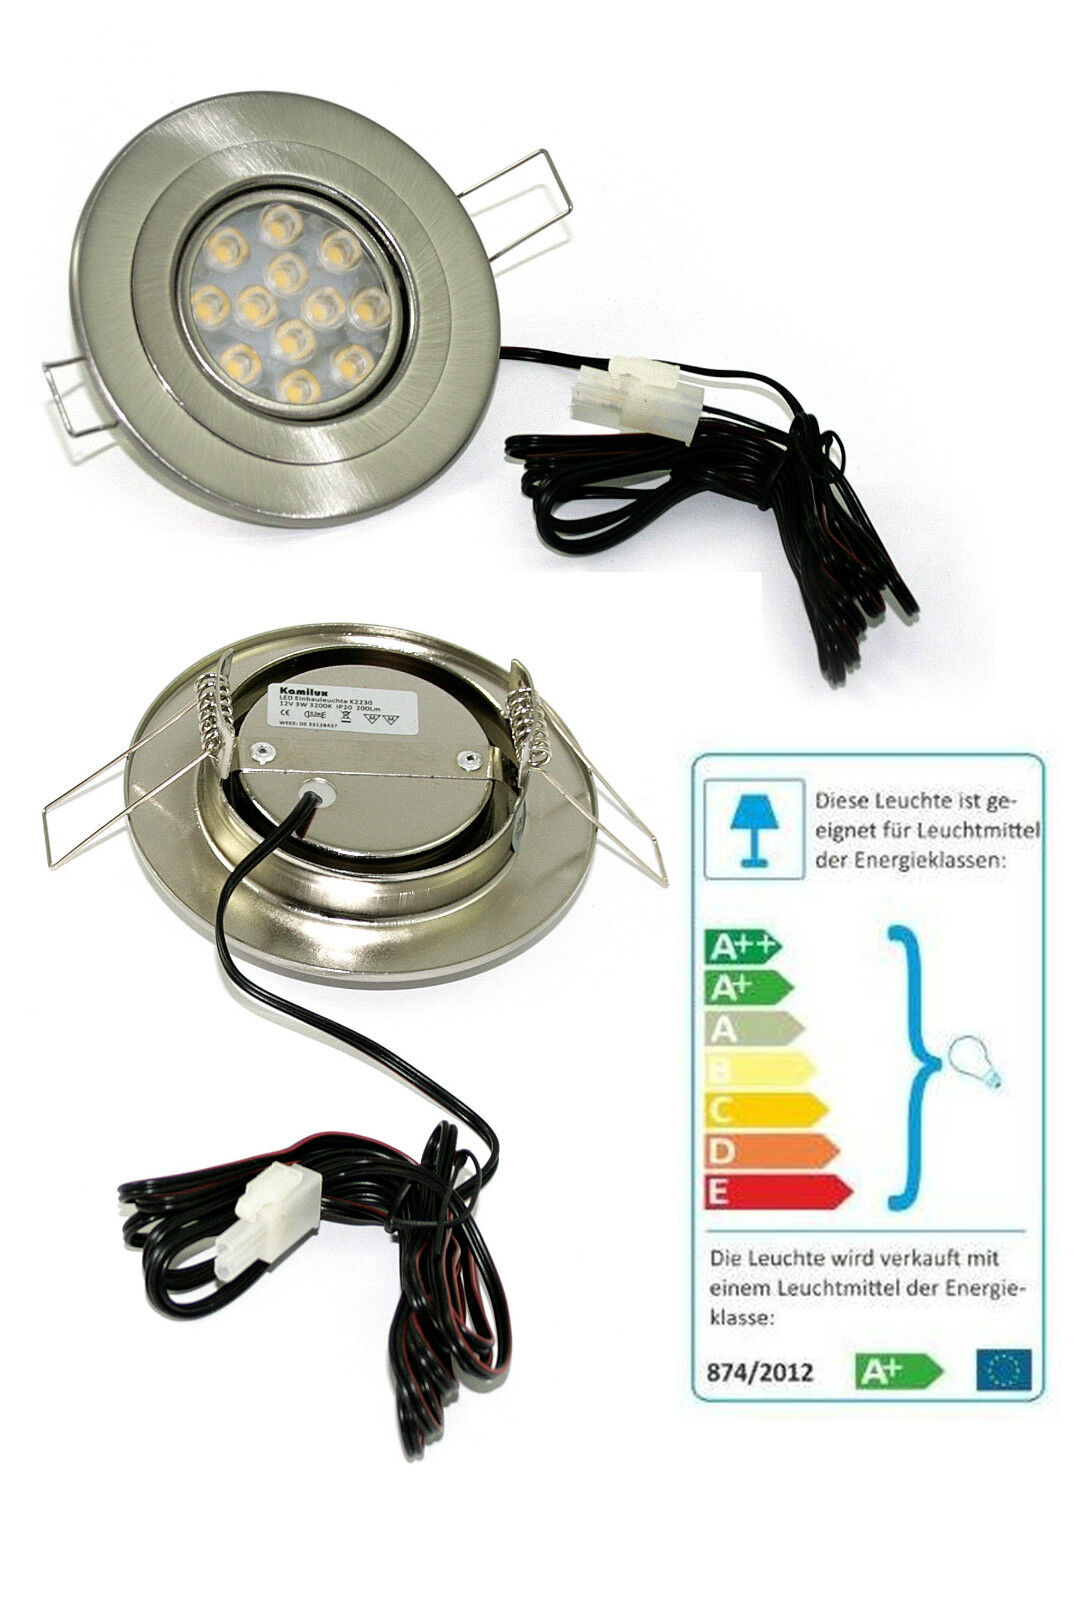 Flache LED Einbaustrahler 12V Eli 3W =25W geringe ET 1,5m Kabel ohne Trafo